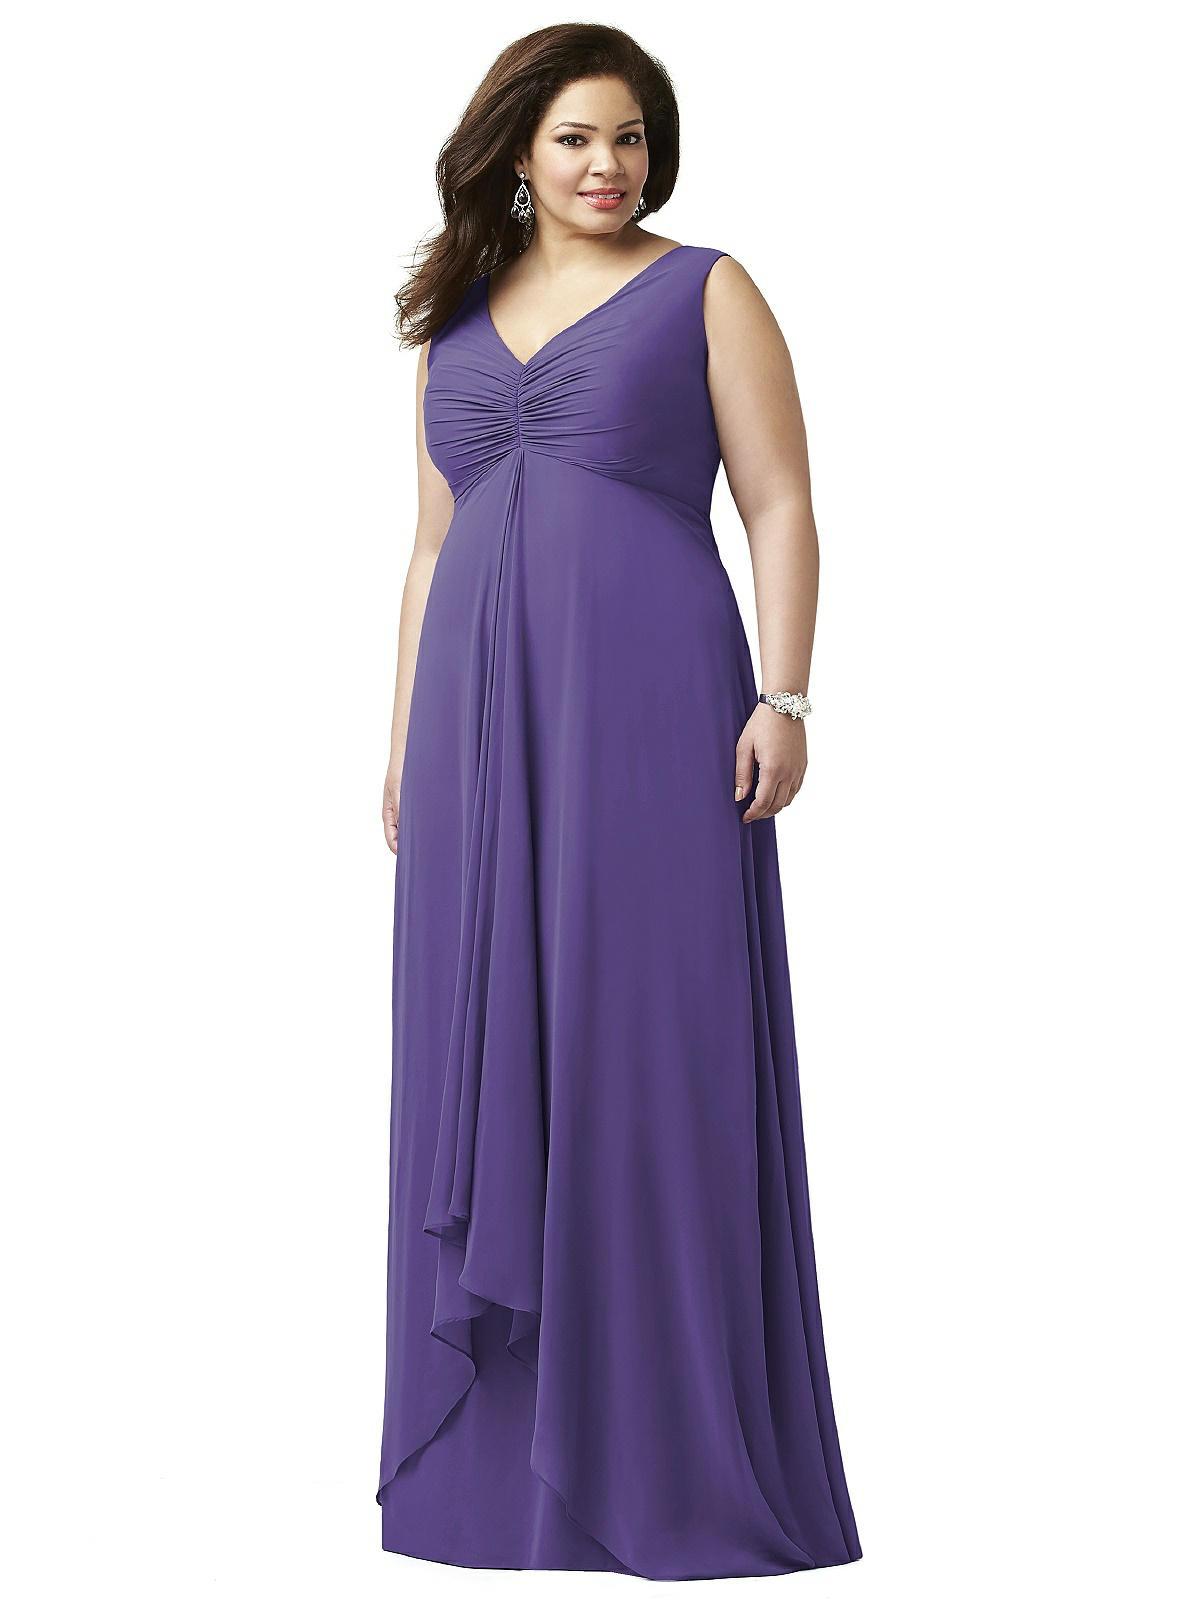 Lovelie Plus Size Bridesmaid Dress 9002: The Dessy Group